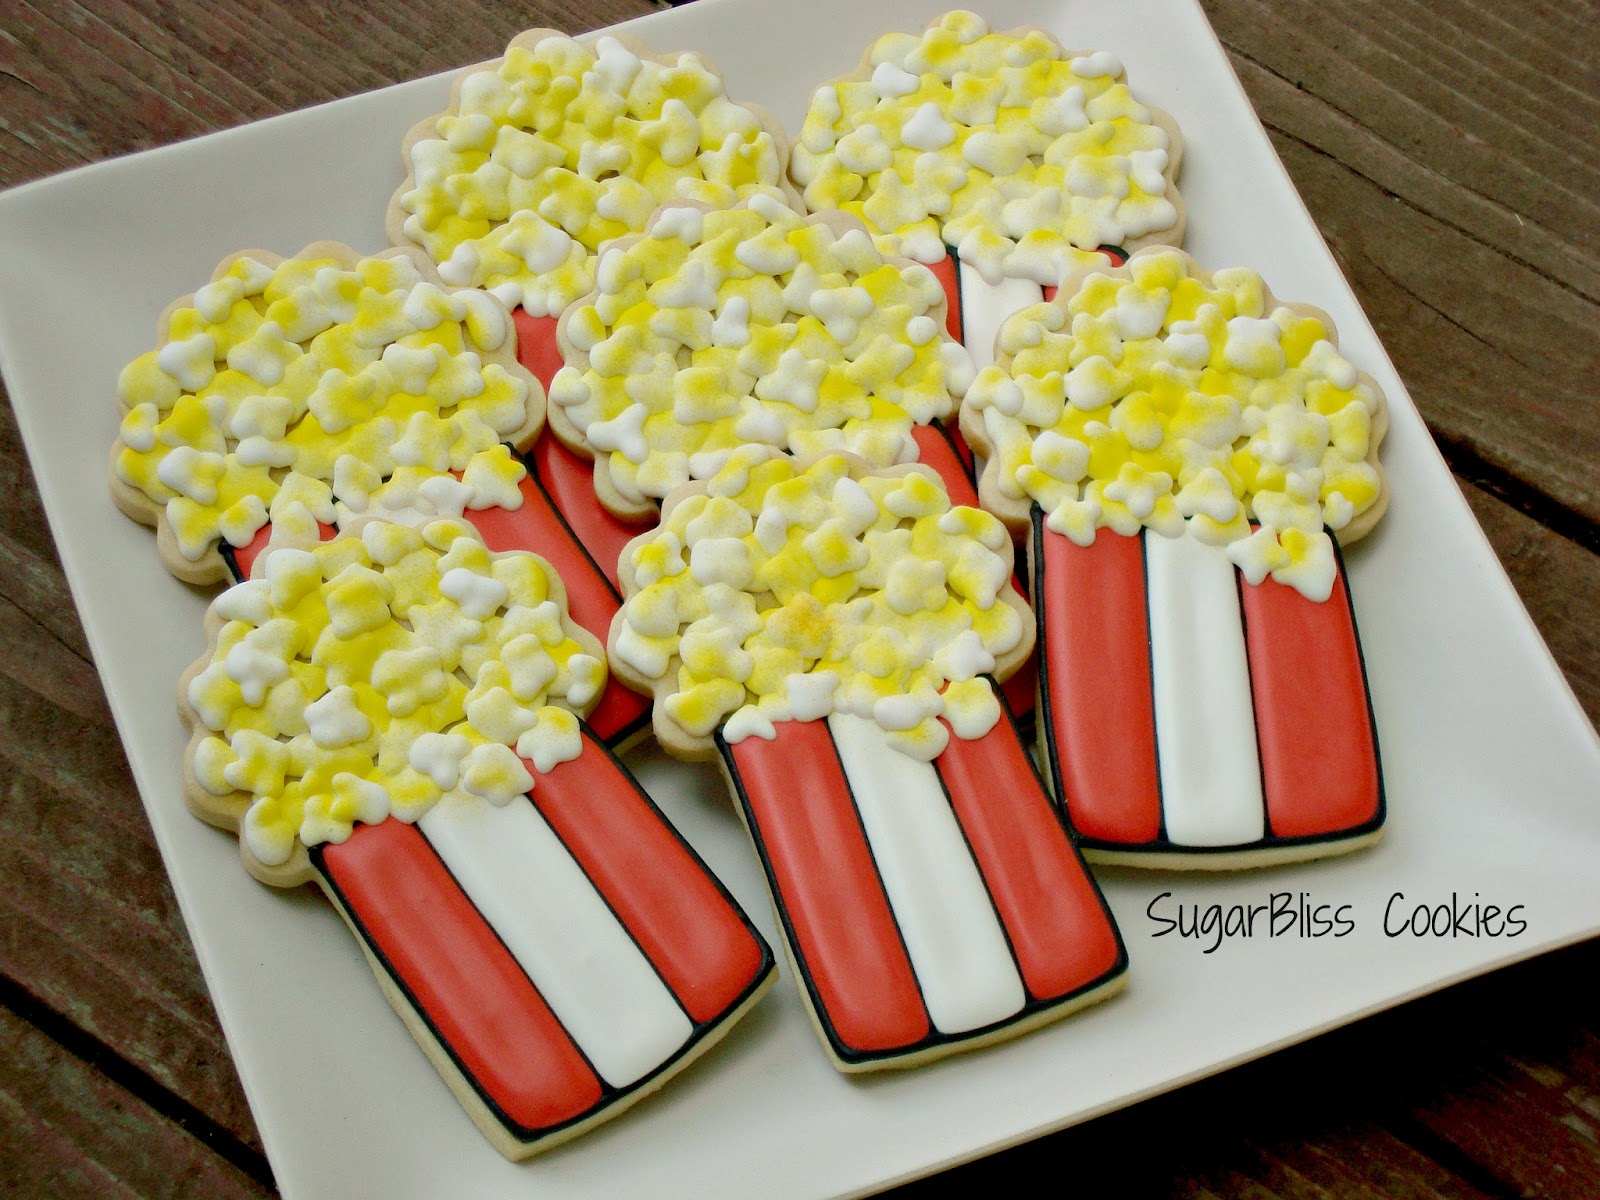 SugarBliss Cookies: SugarBliss Popcorn